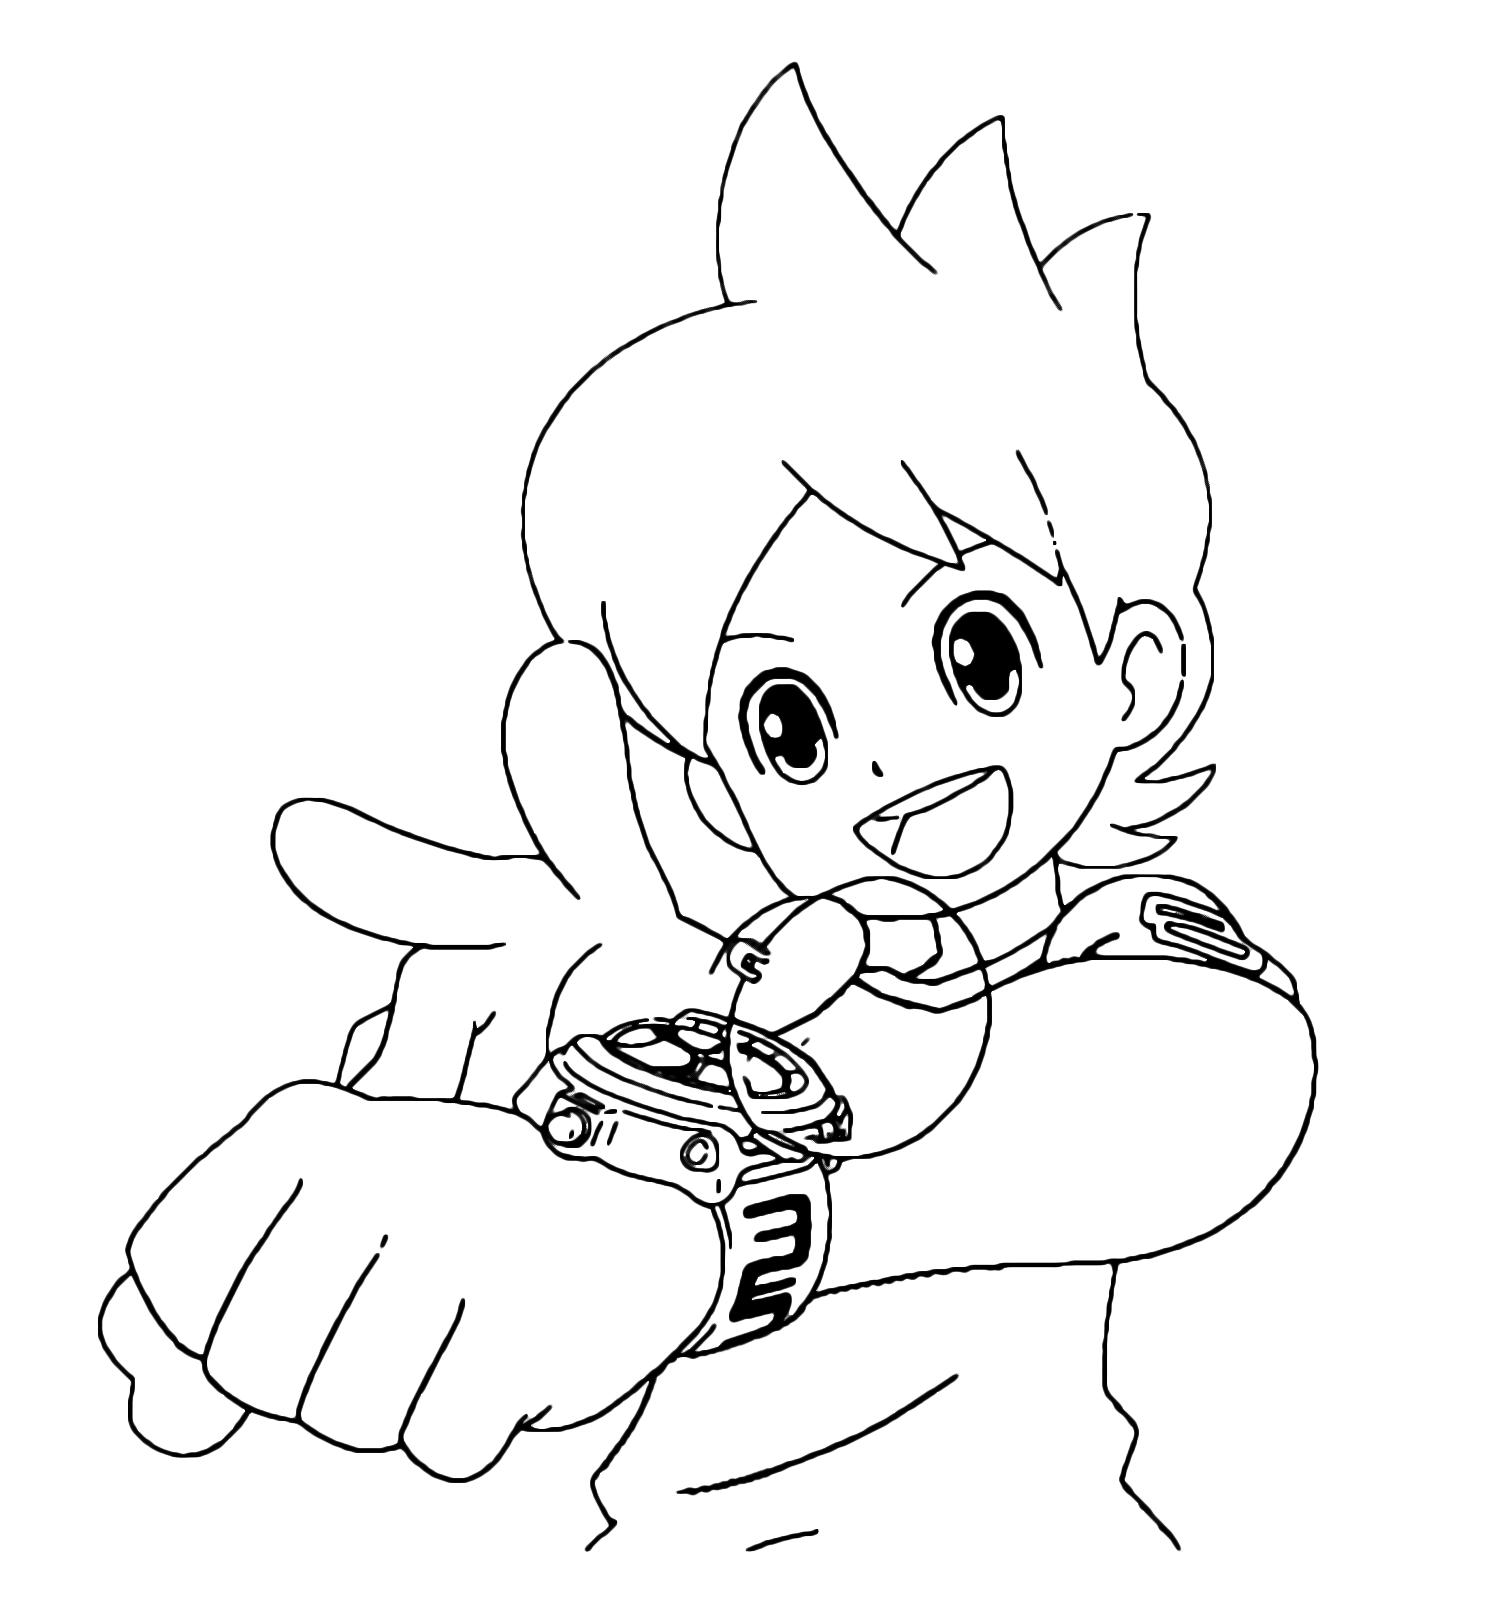 Yo Kai Watch Nate Is About To Activate The Yo Kai Watch